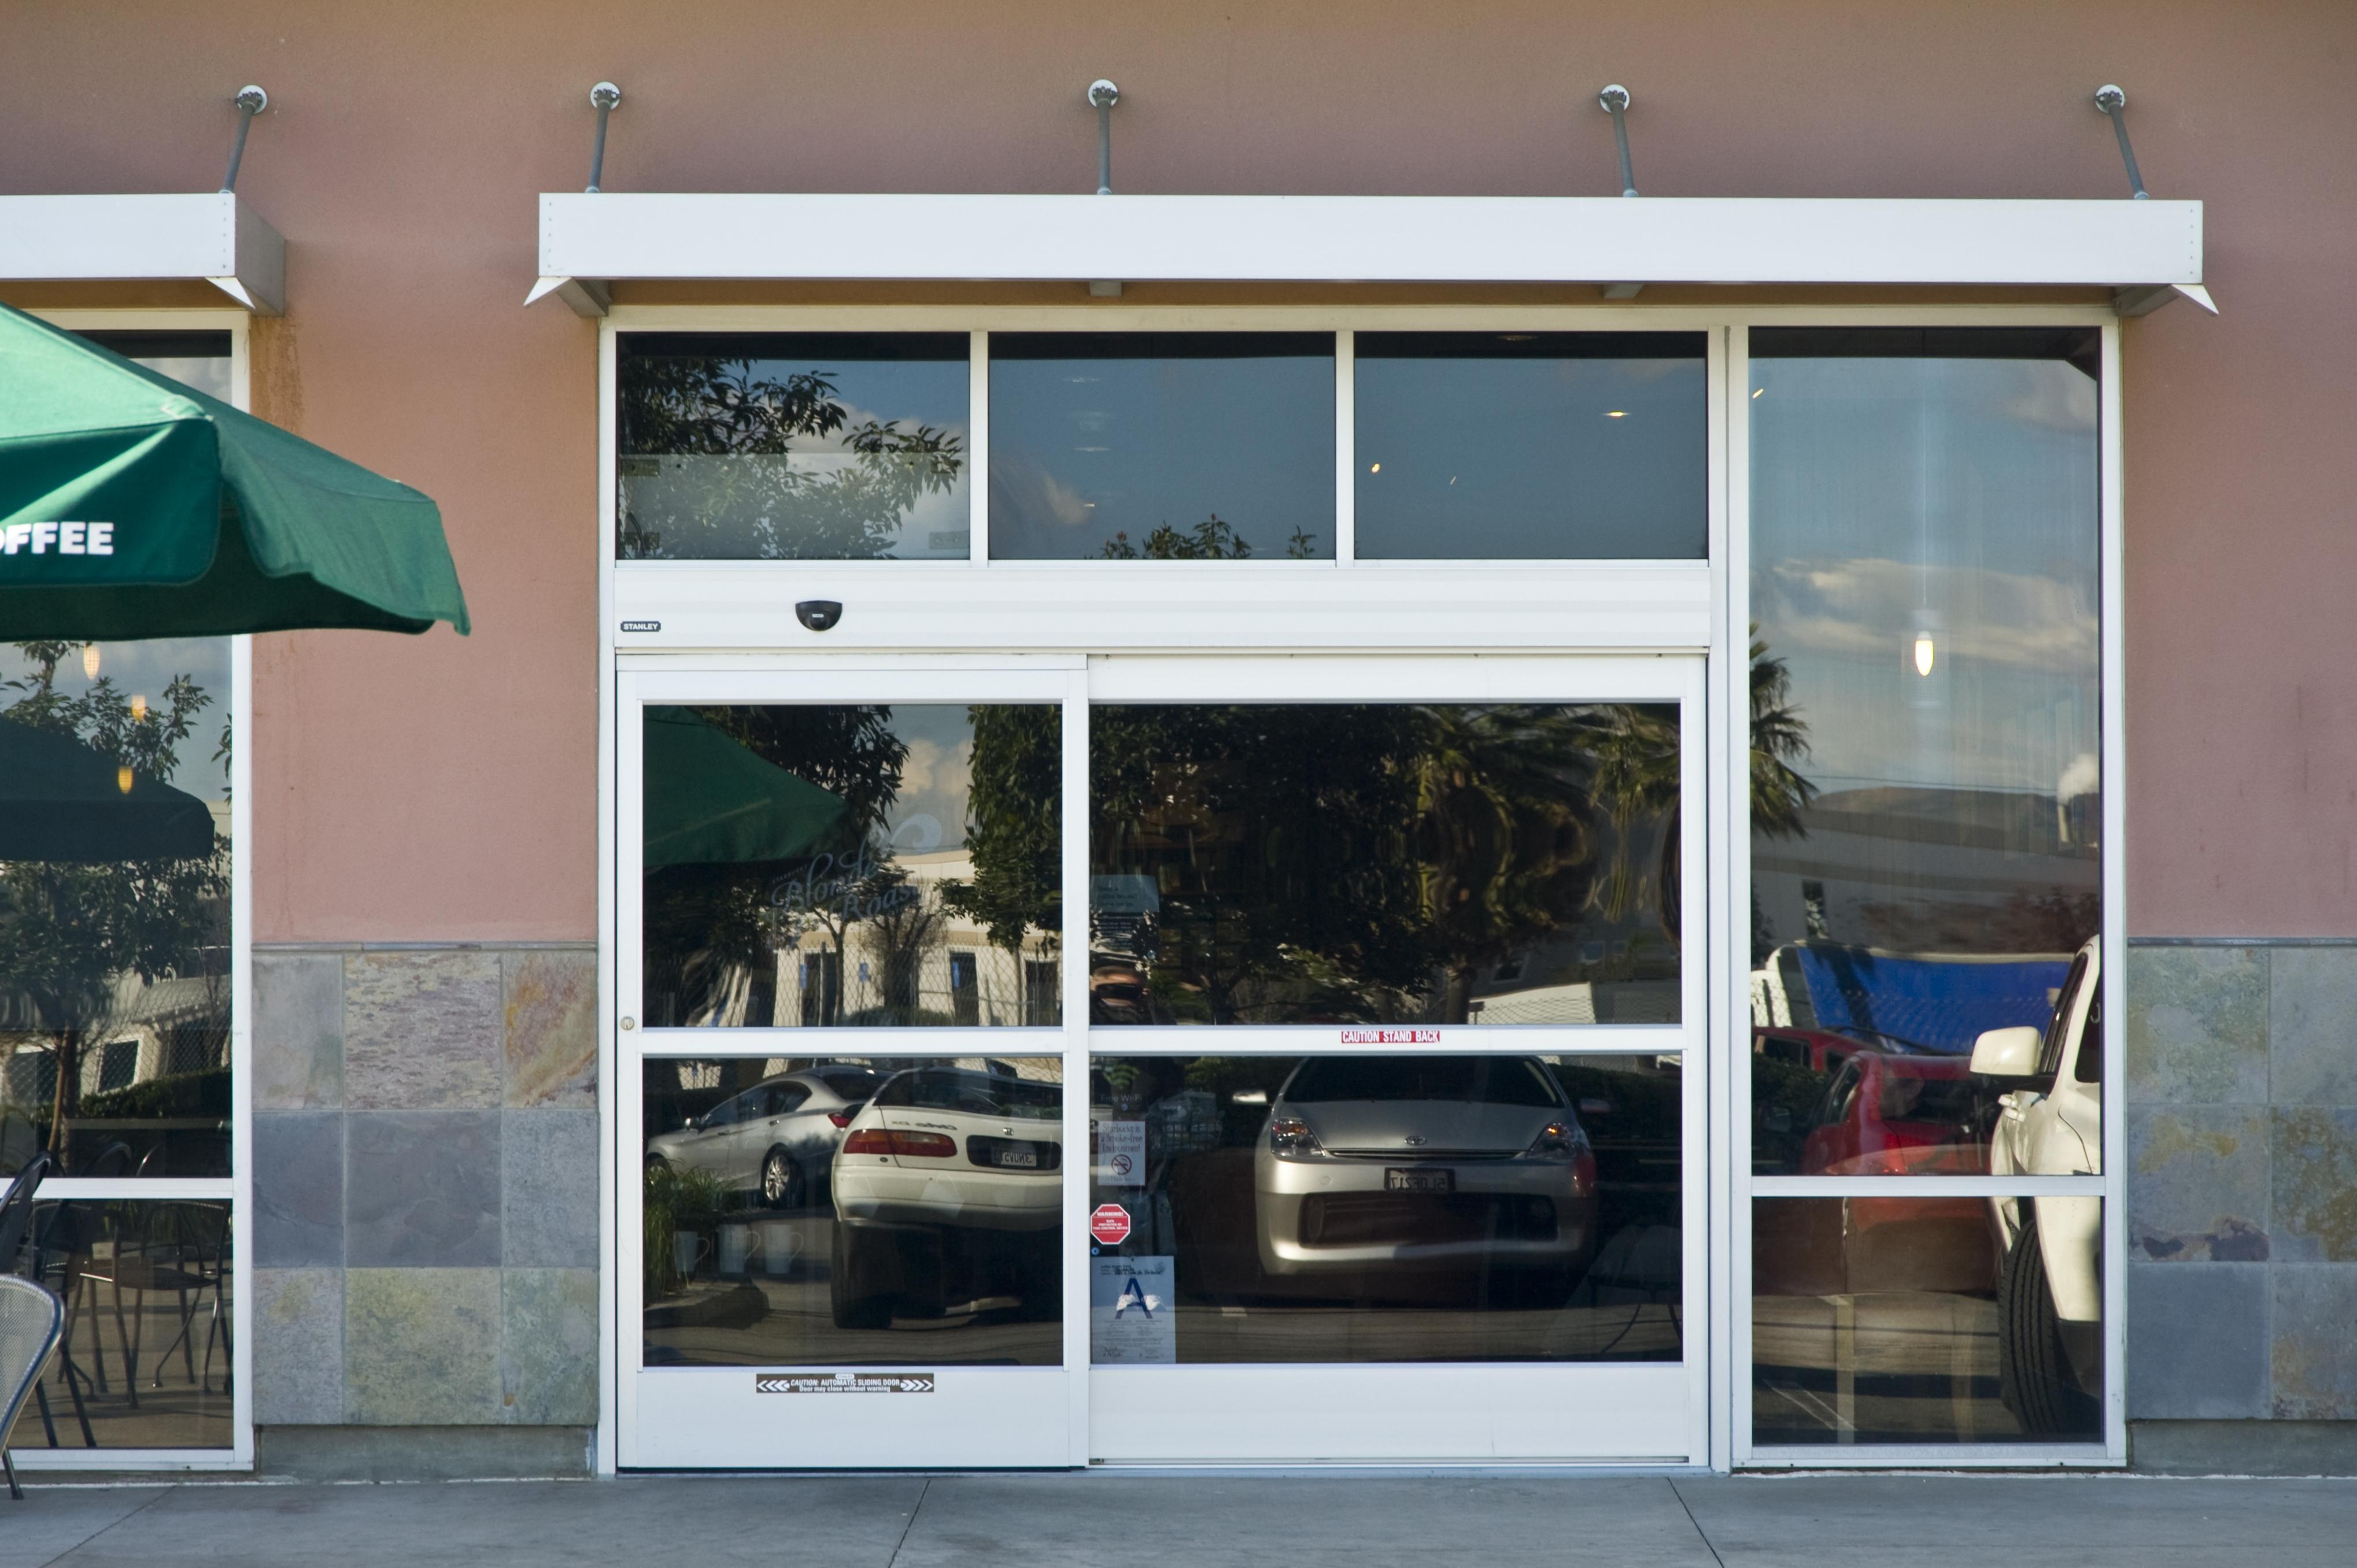 Stanley Automatic Sliding Glass Doors4076 X 2712